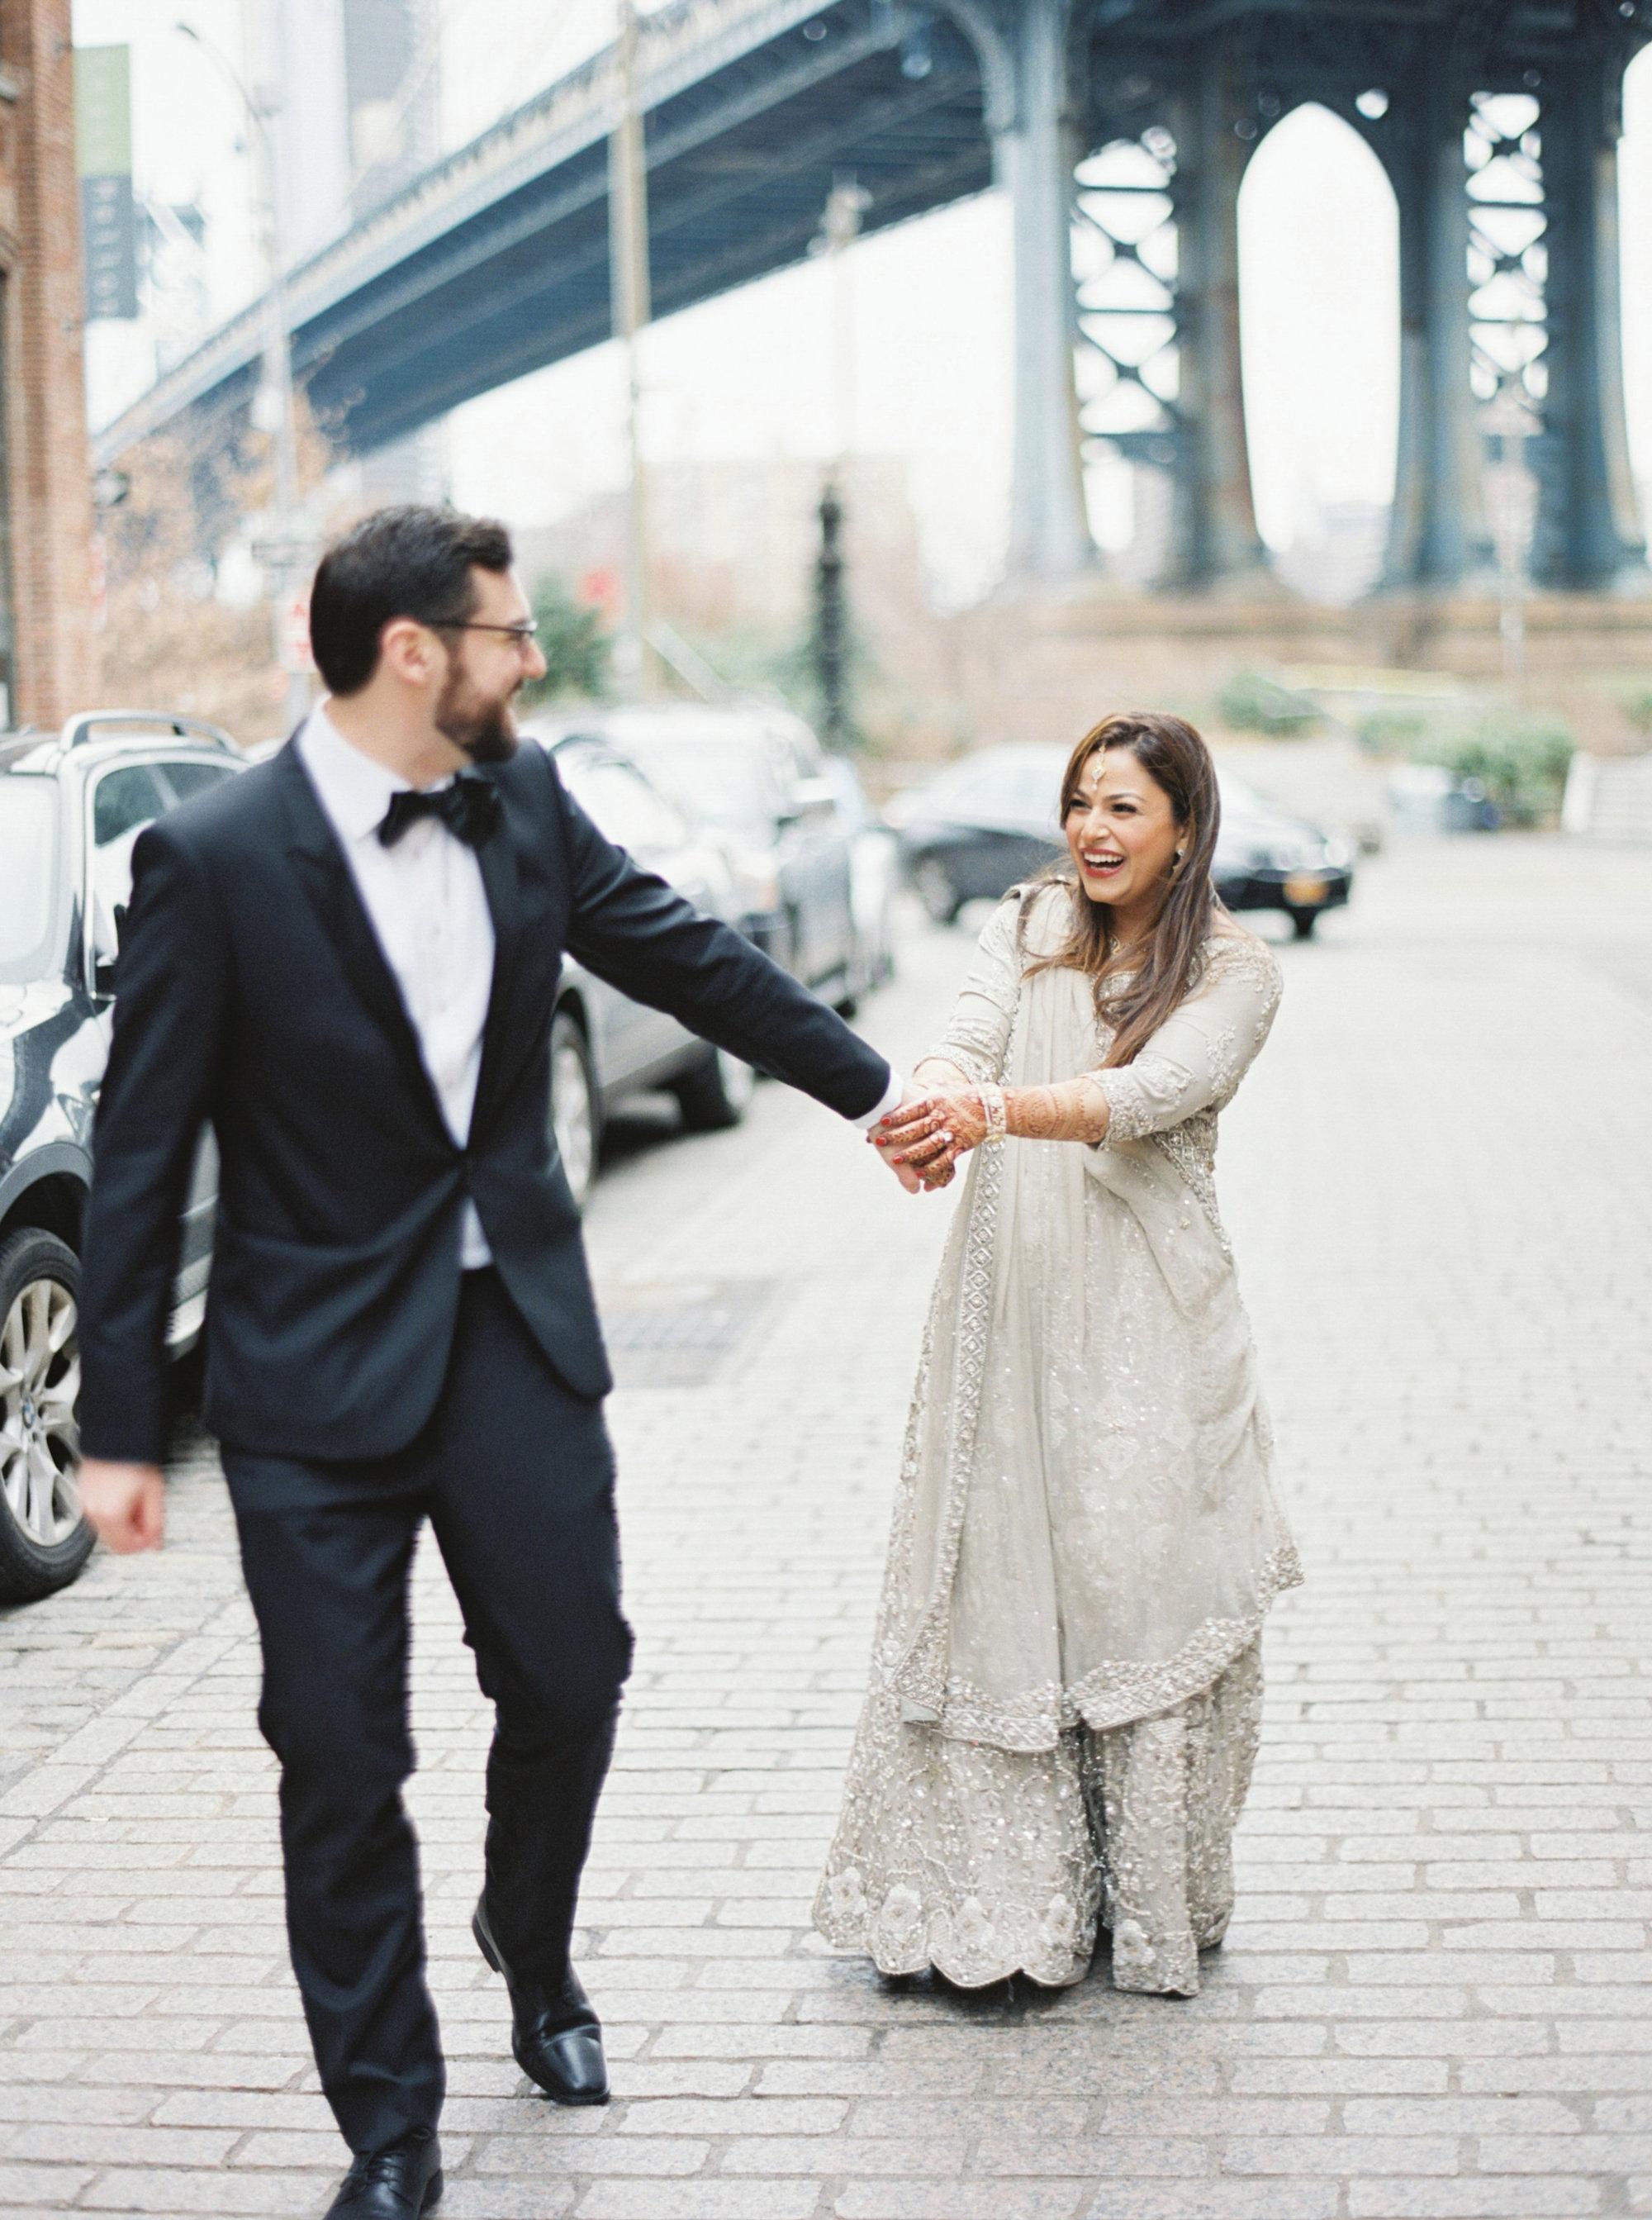 Fun Couple Portrait | Colorful & Sweet Brooklyn Wedding | The Green Building